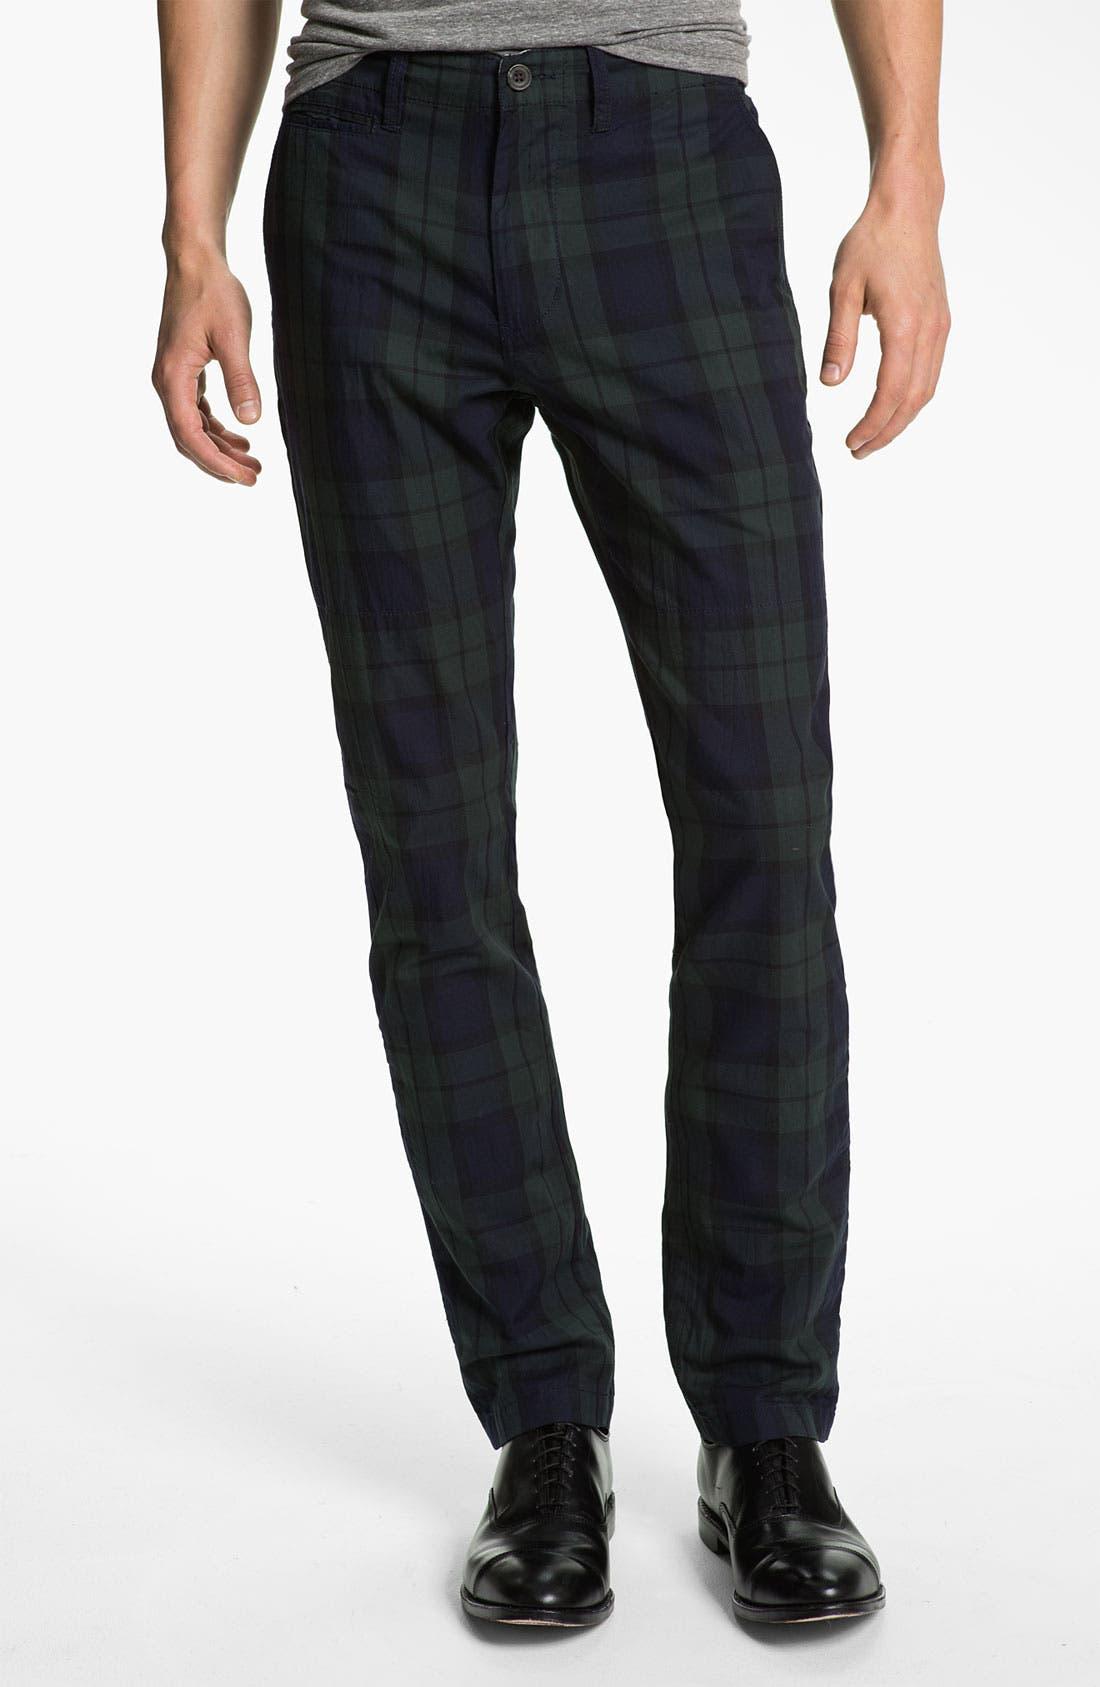 Main Image - Just A Cheap Shirt Tartan Plaid Slim Straight Leg Chinos